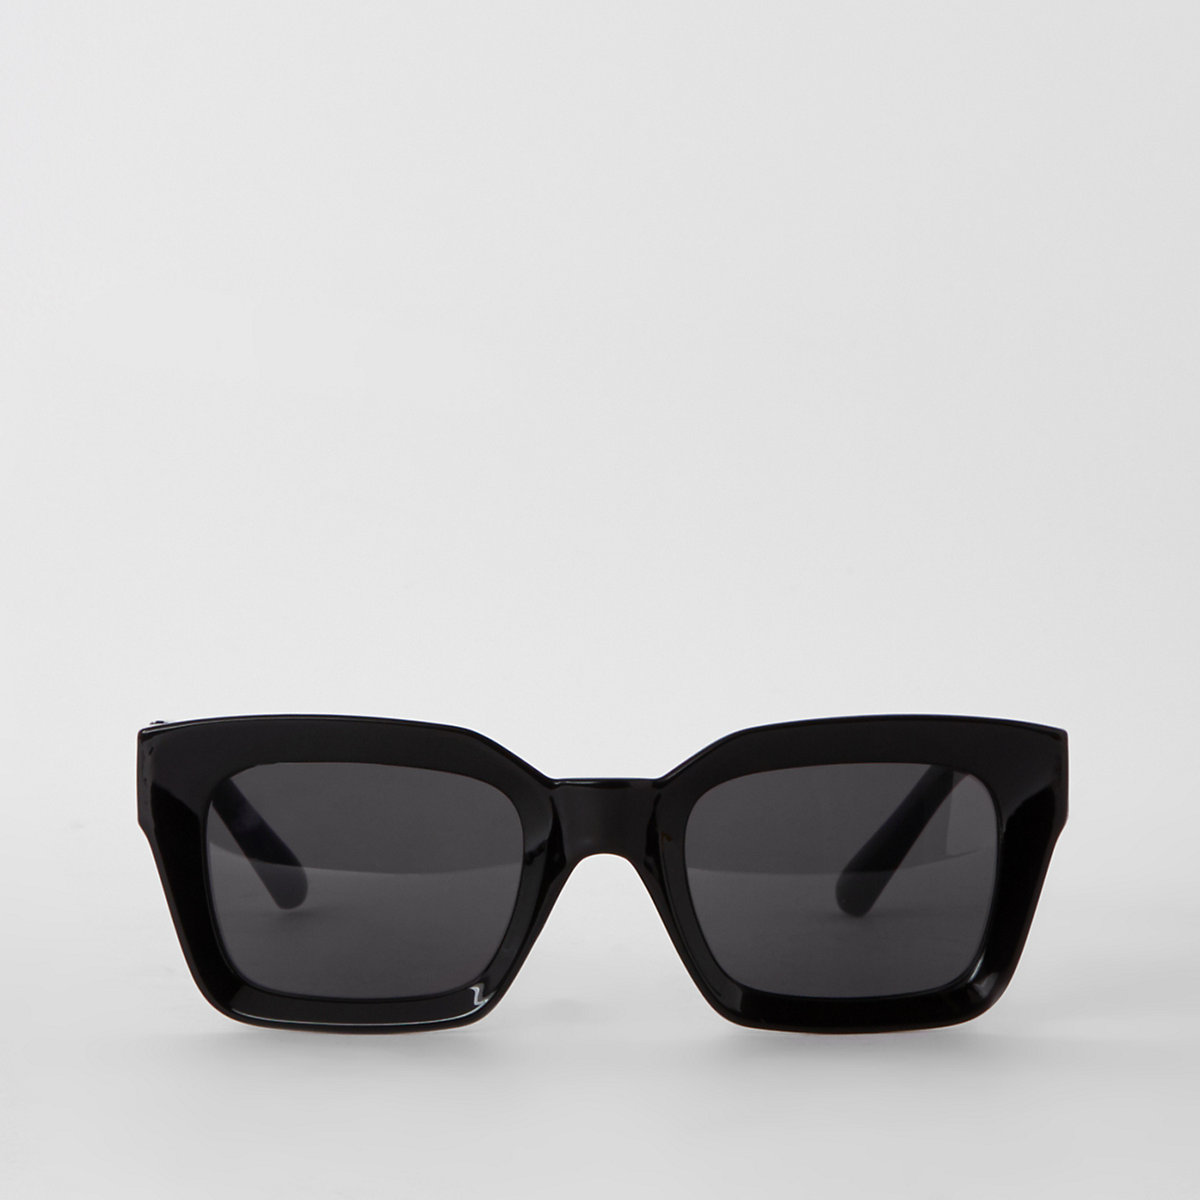 Black glam smoke lens sunglasses